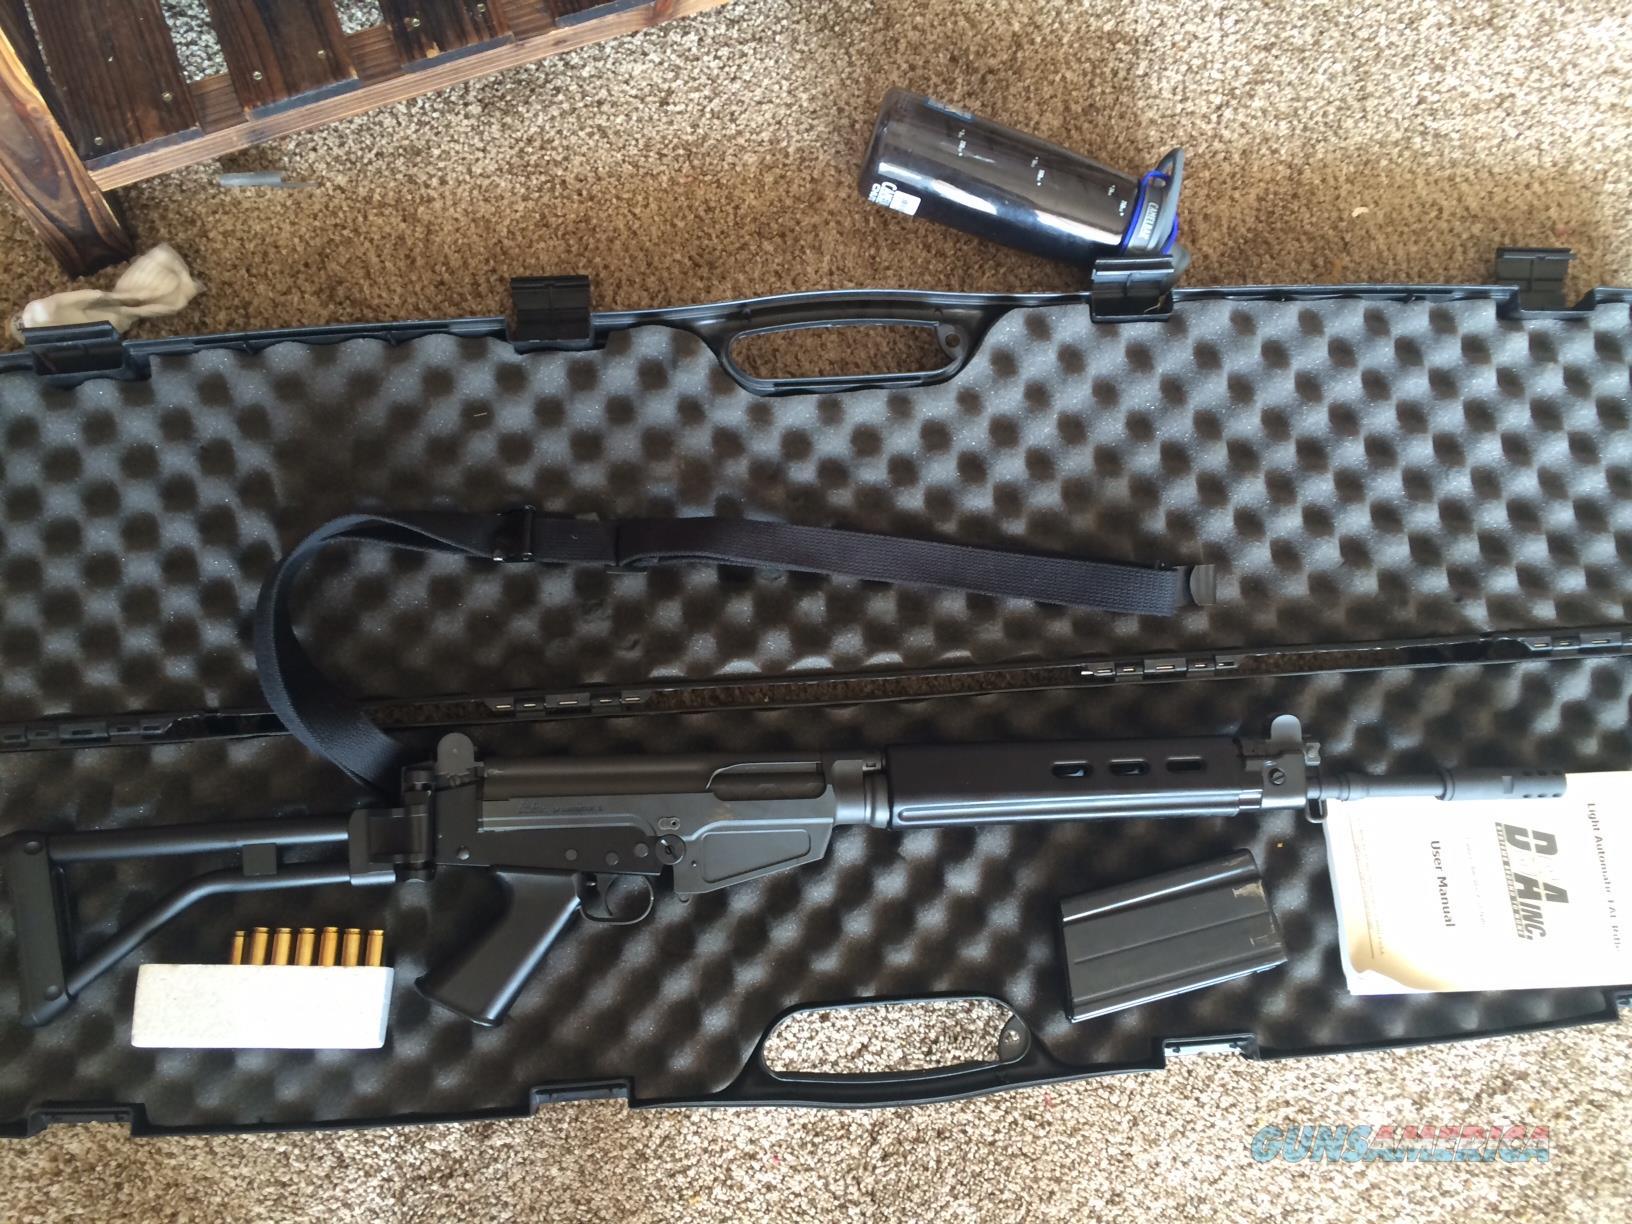 DSA Para (side folding stock) 18' inch barrel FAL